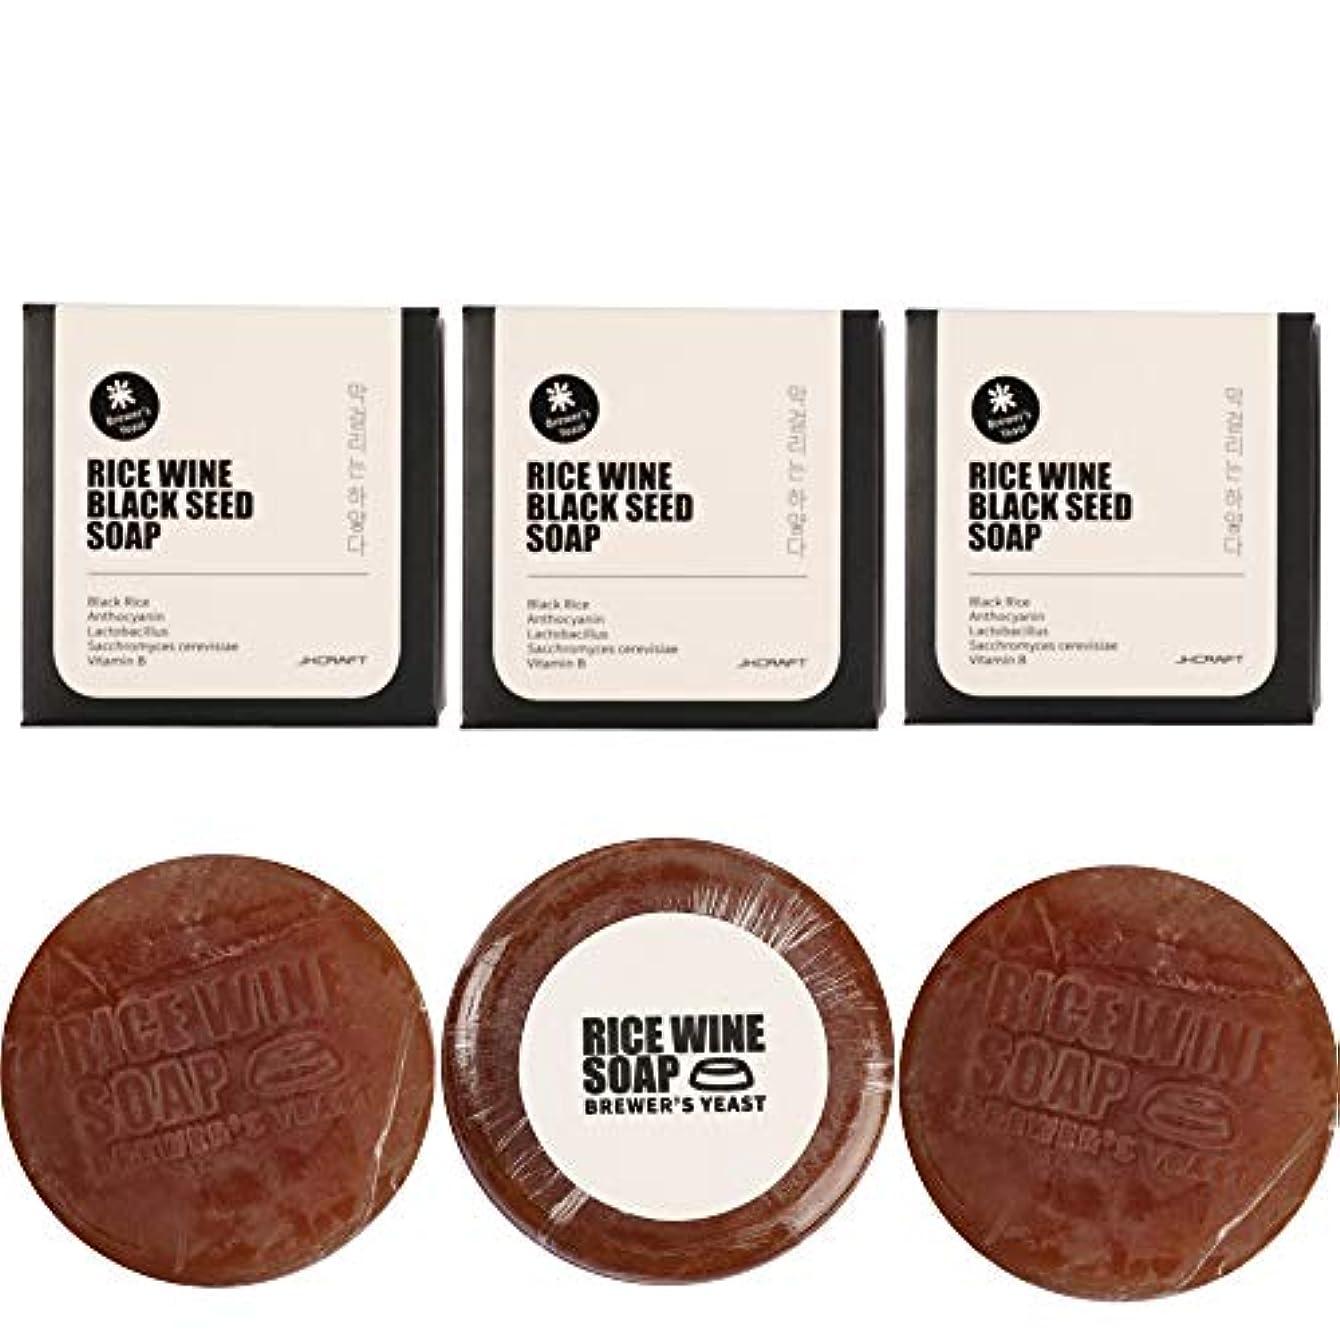 器官自伝相談するJKCRAFT RICEWINE BLACK SEED SOAP 黒米マッコリ酵母石鹸,無添加,無刺激,天然洗顔石鹸 3pcs [並行輸入品]